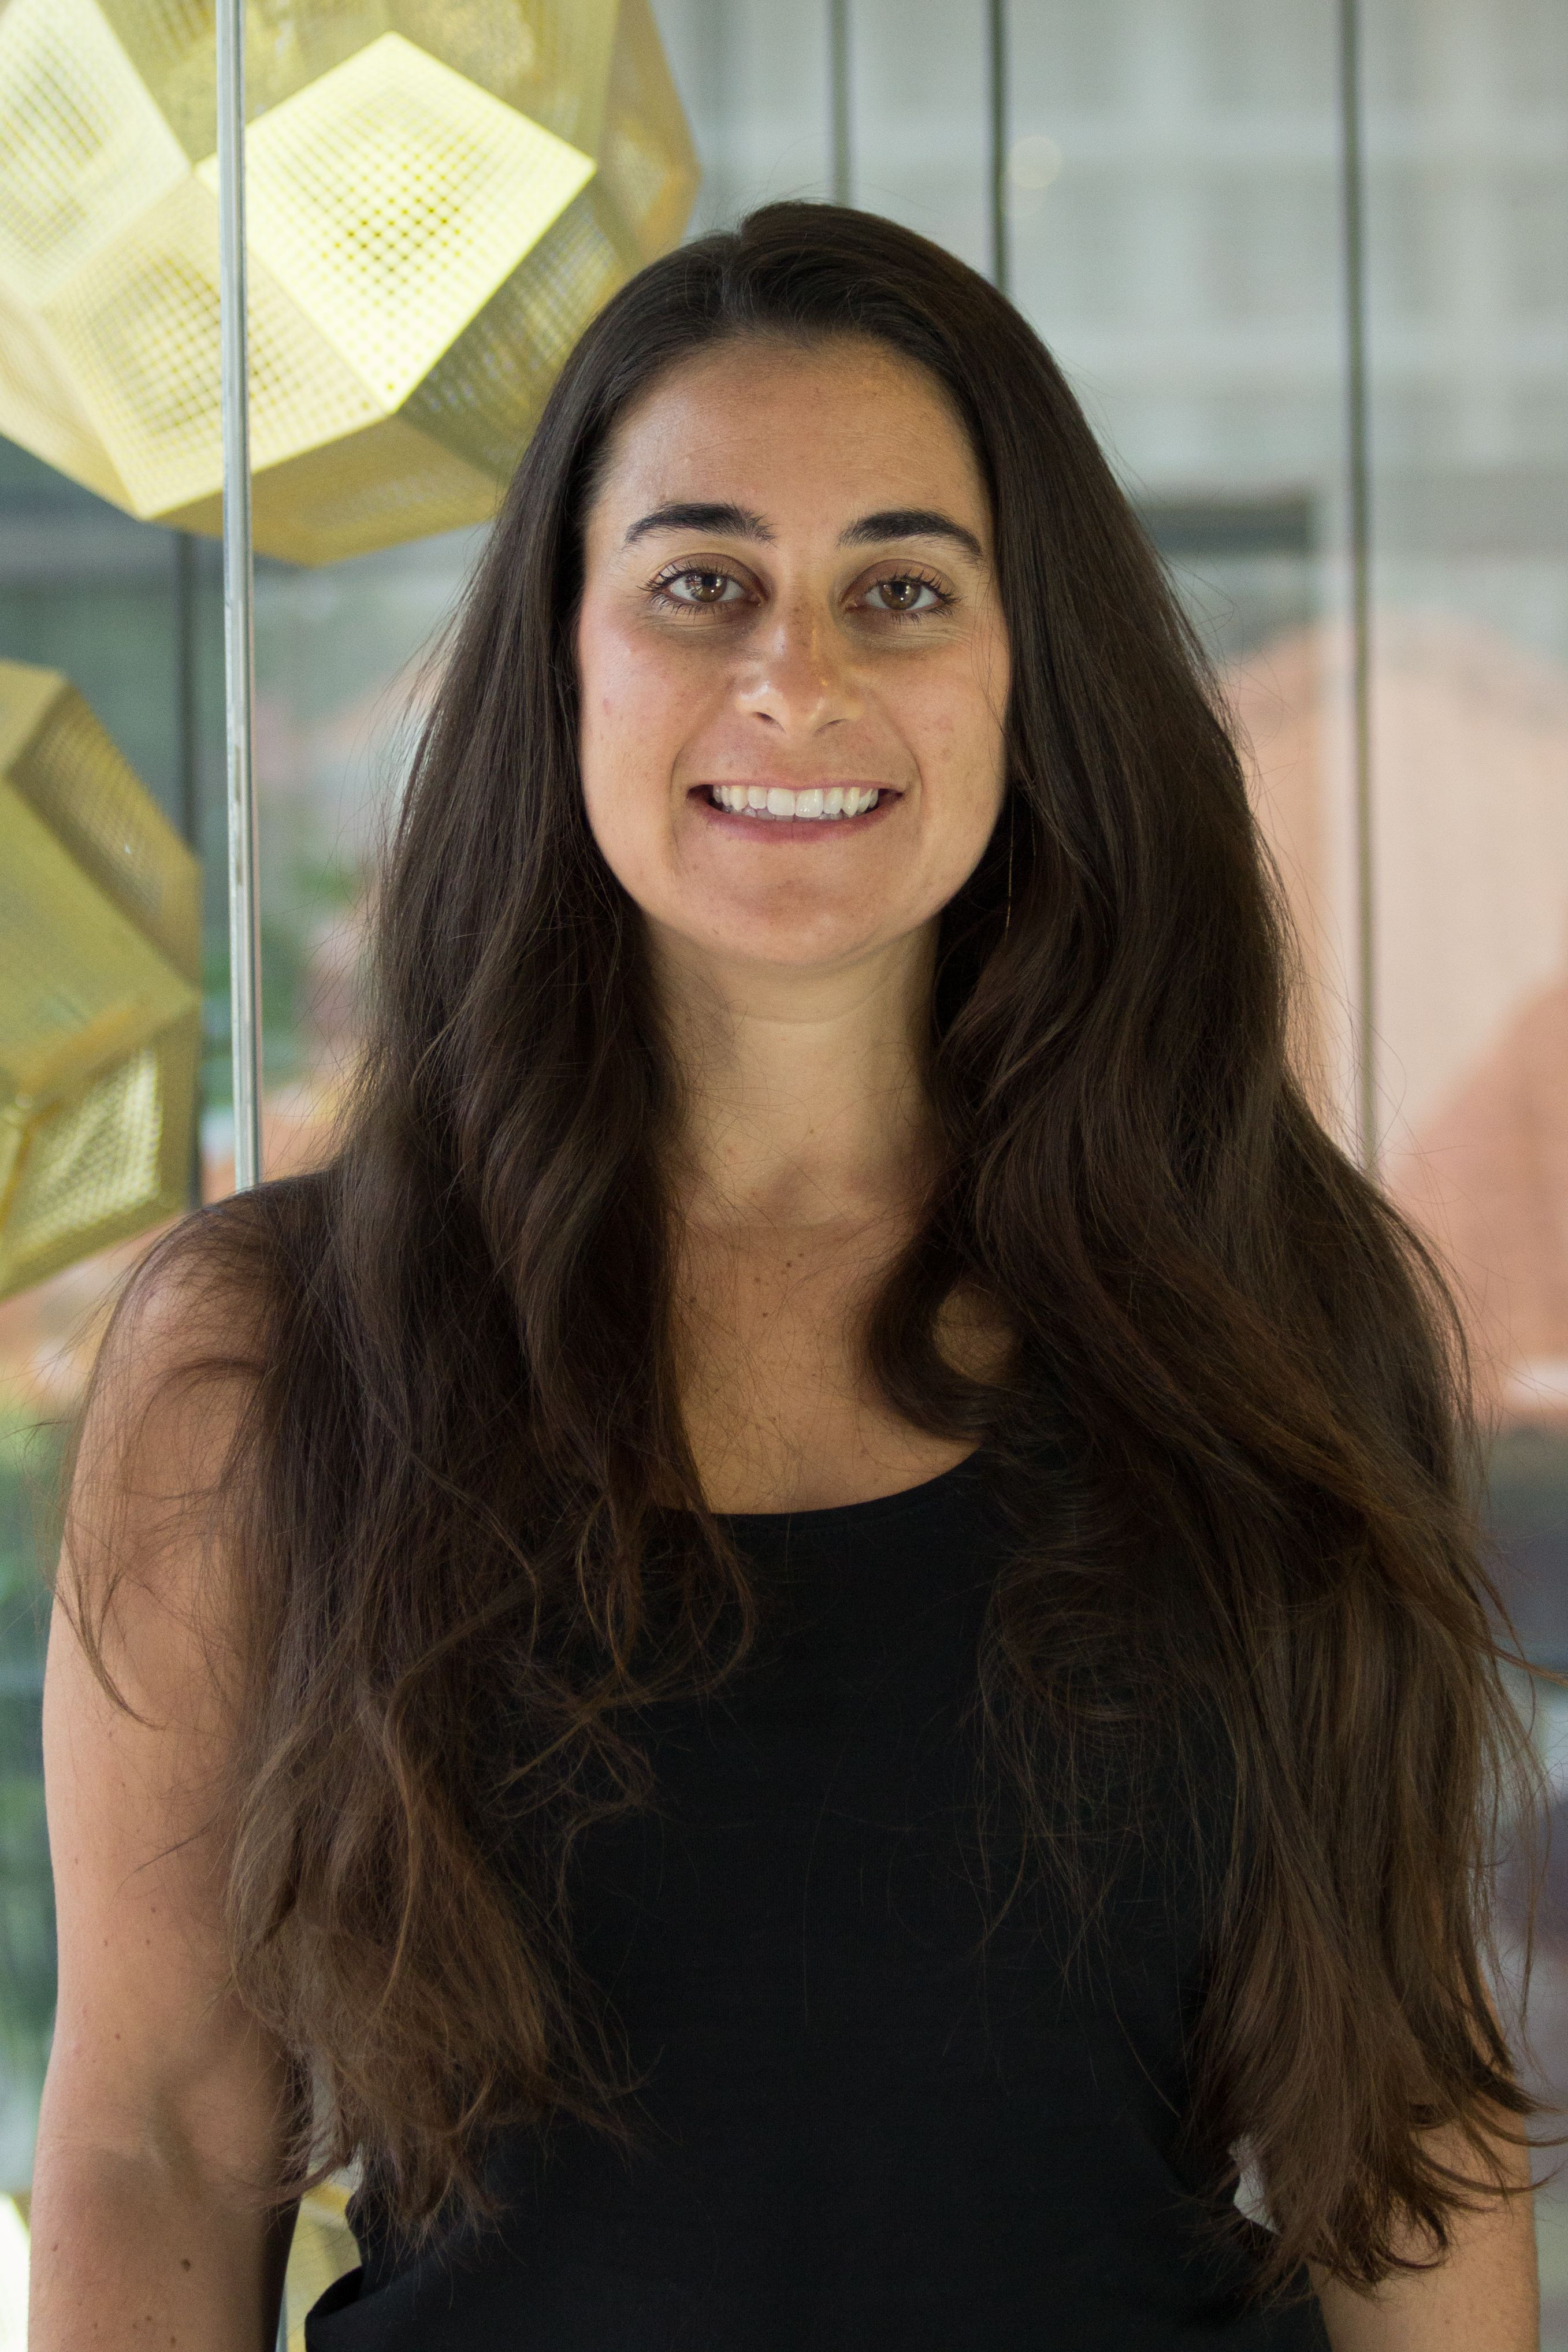 Sarah - Women in Miami Tech (Miami, FL) | Meetup